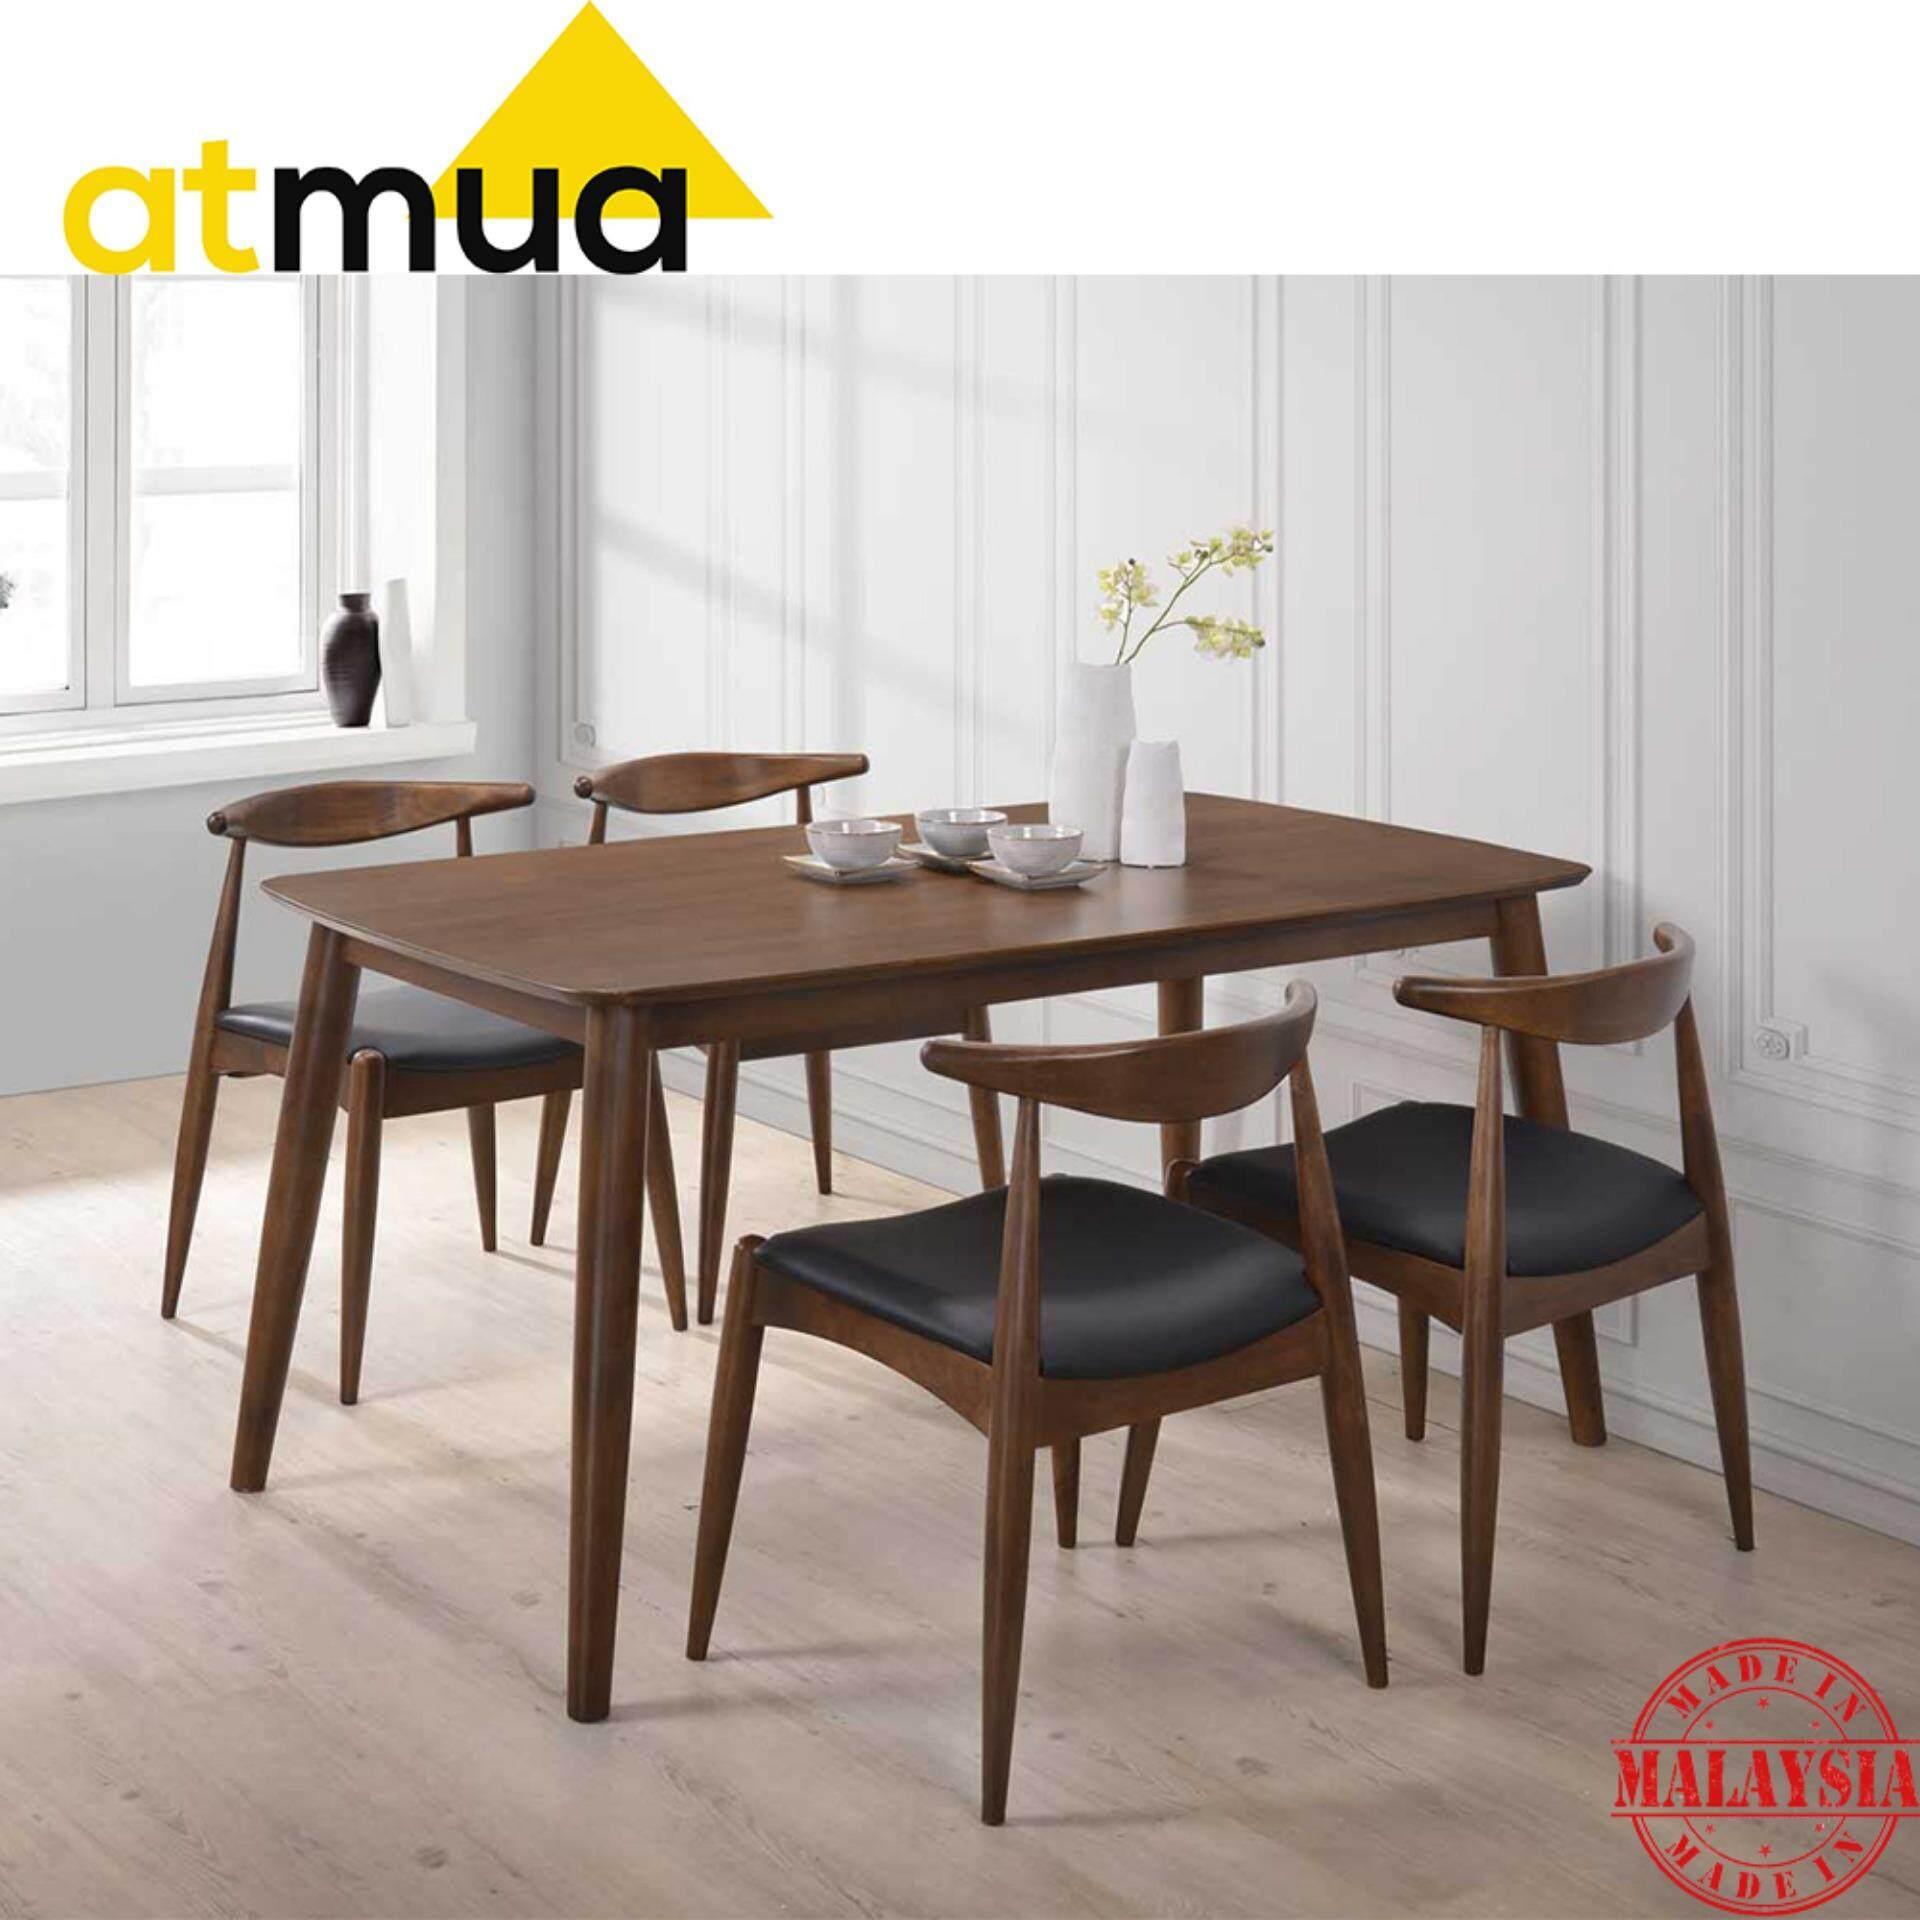 Atmua Olim Scandinavian Dining Set (1 Table + 4 Chairs) - Scandinavian Style [Full Solid Wood]